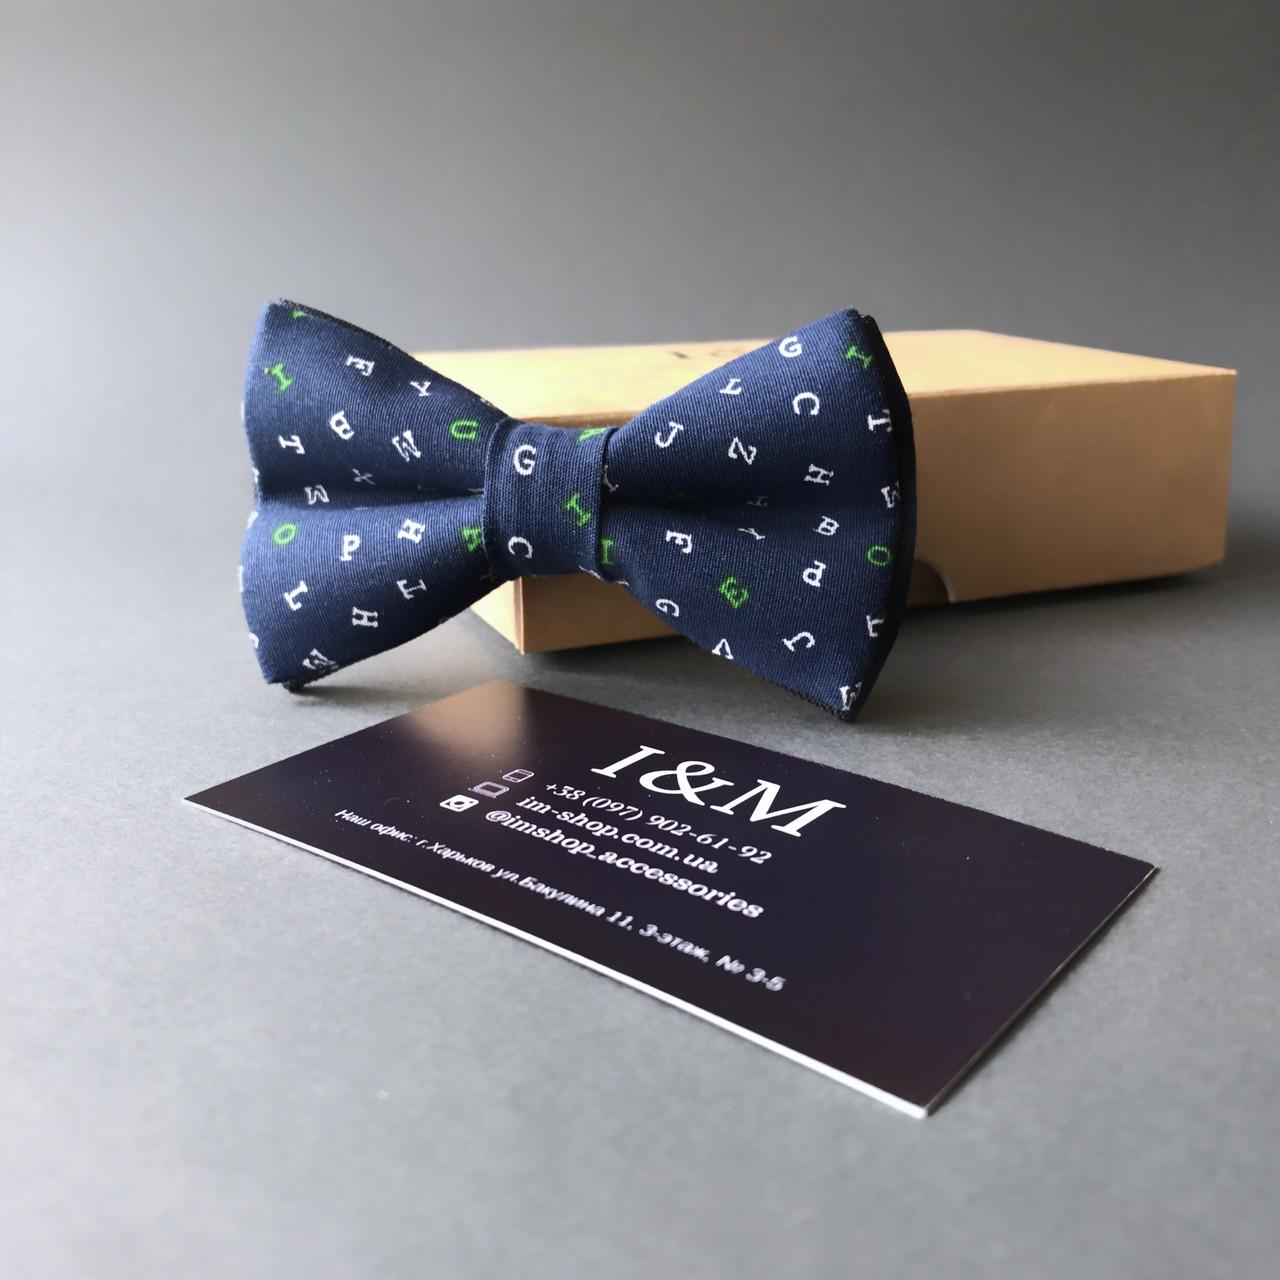 Галстук-бабочка I&M Craft детскийтемно-синий с буквами (00084k)